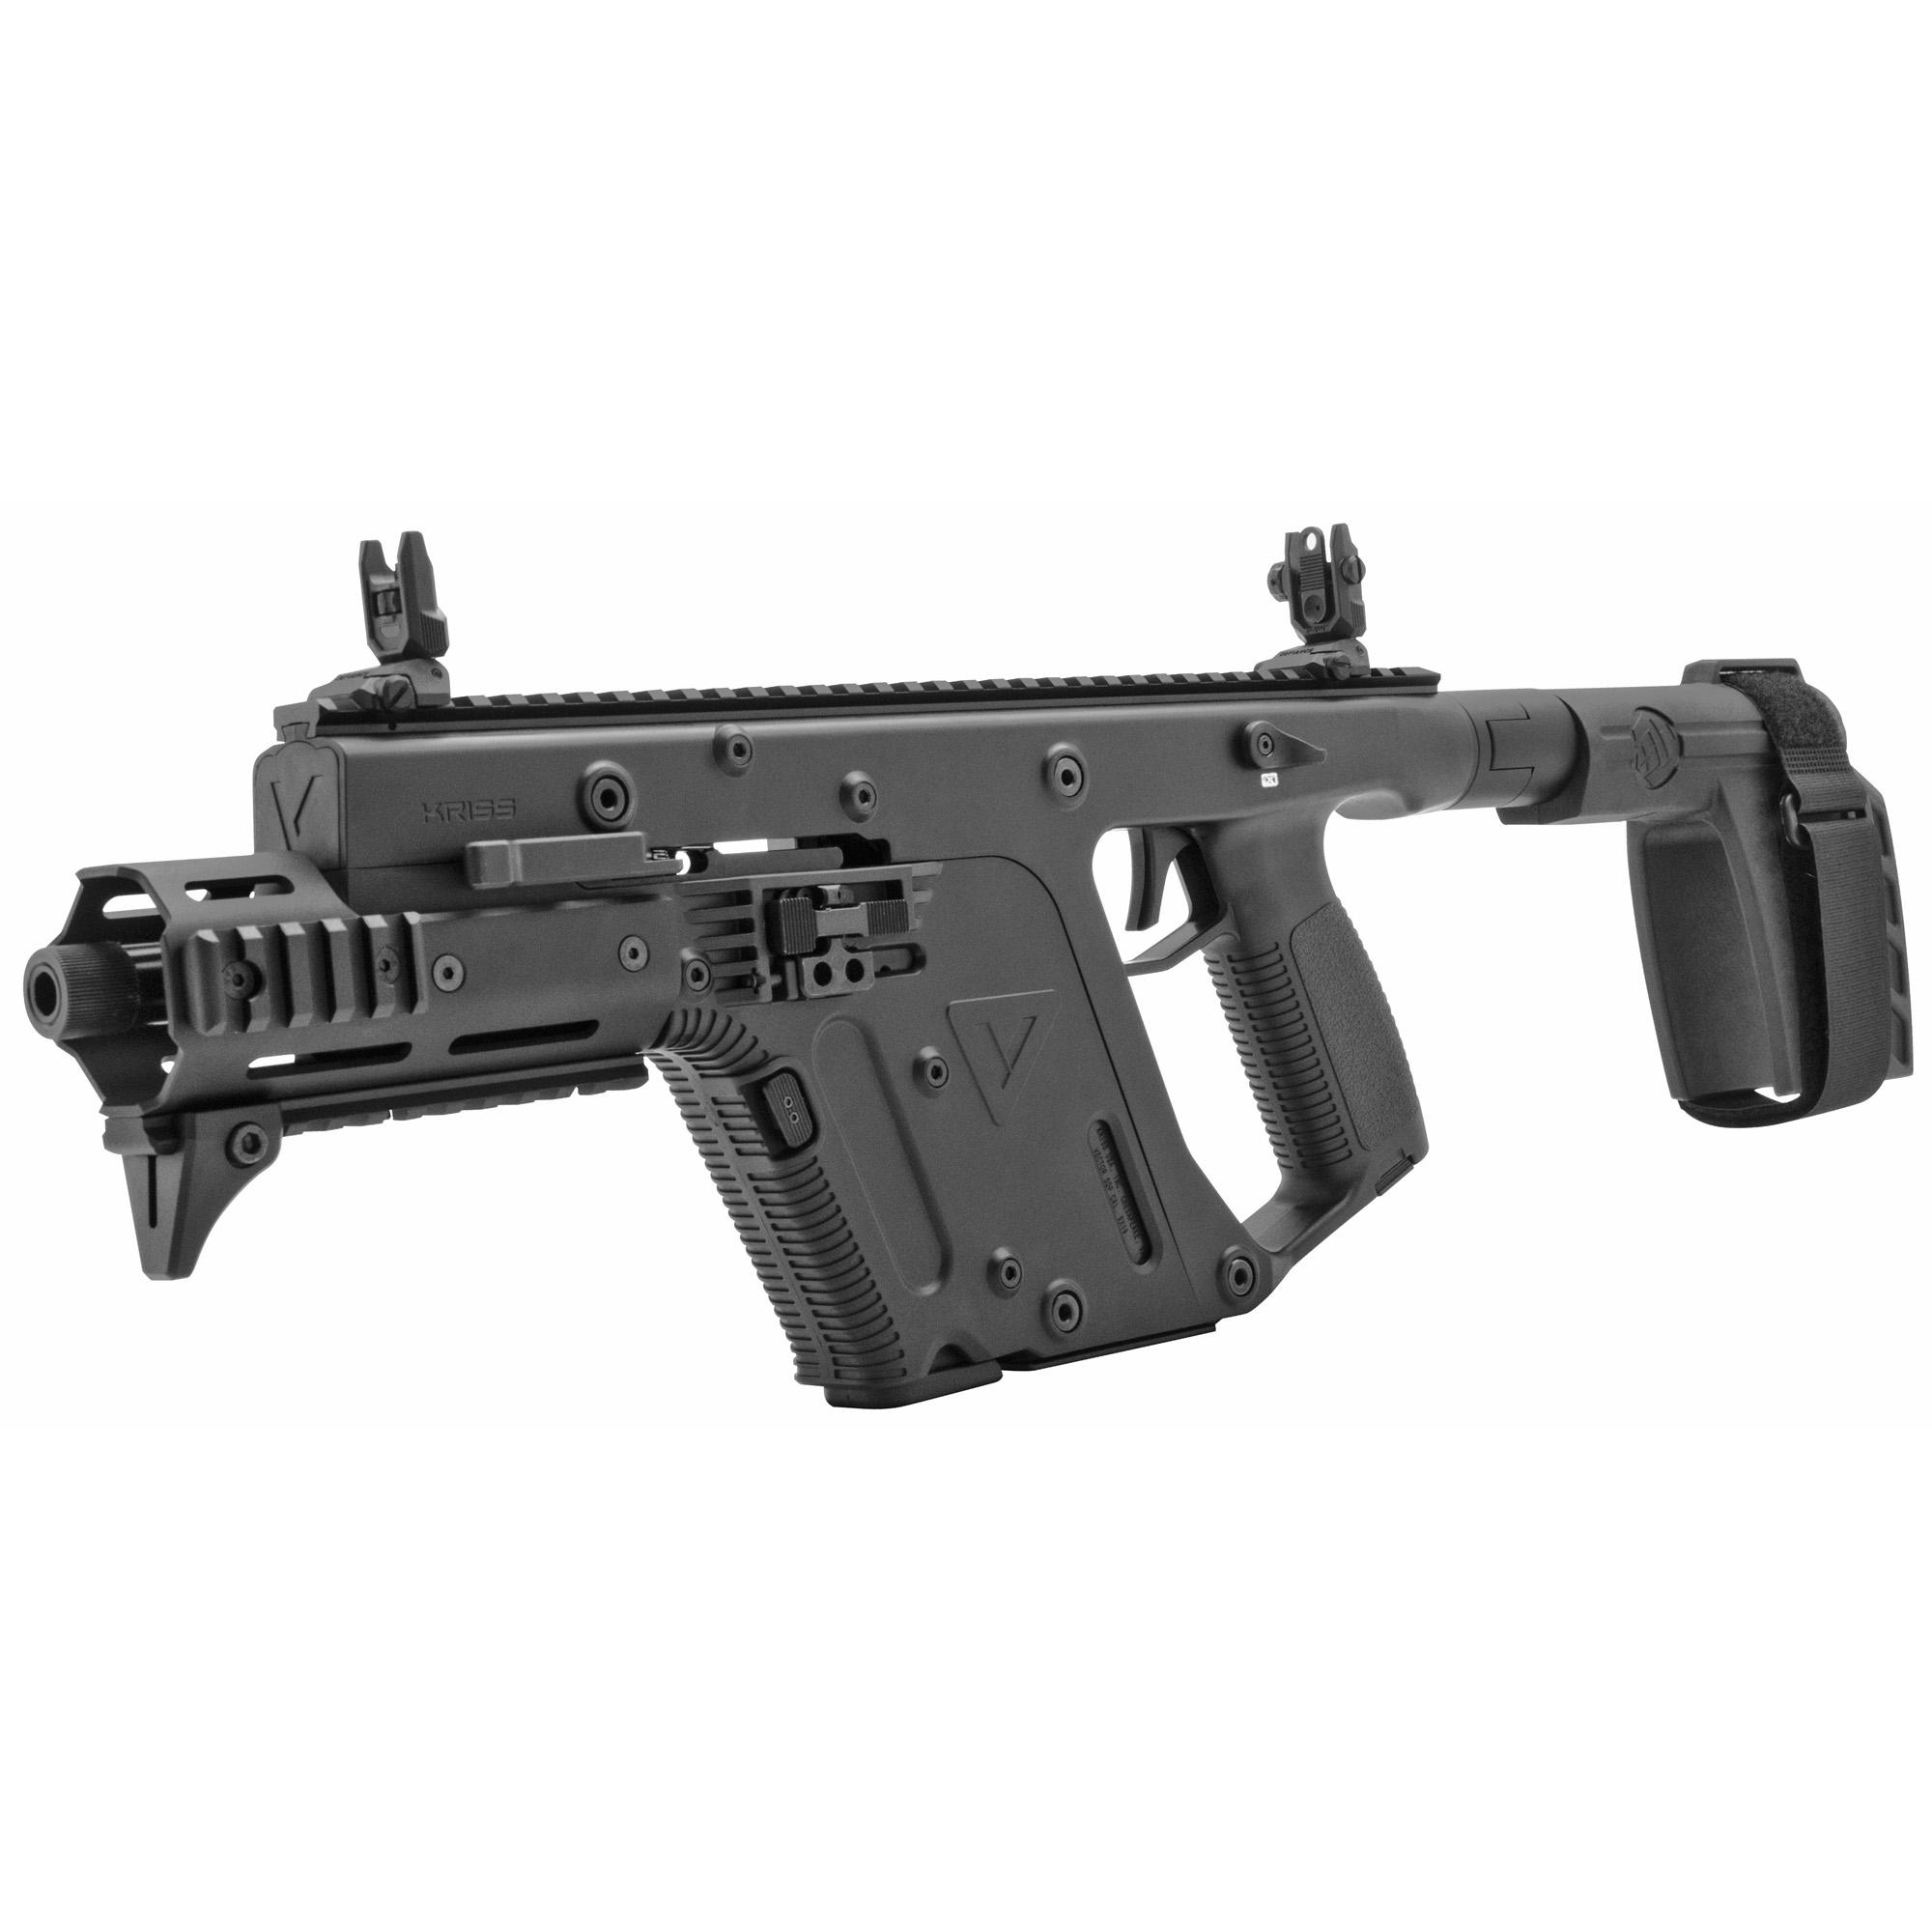 "Kriss Vector Sdp Sbxk 10mm 6.5"" Blk-KRKV10-PSBBL31"